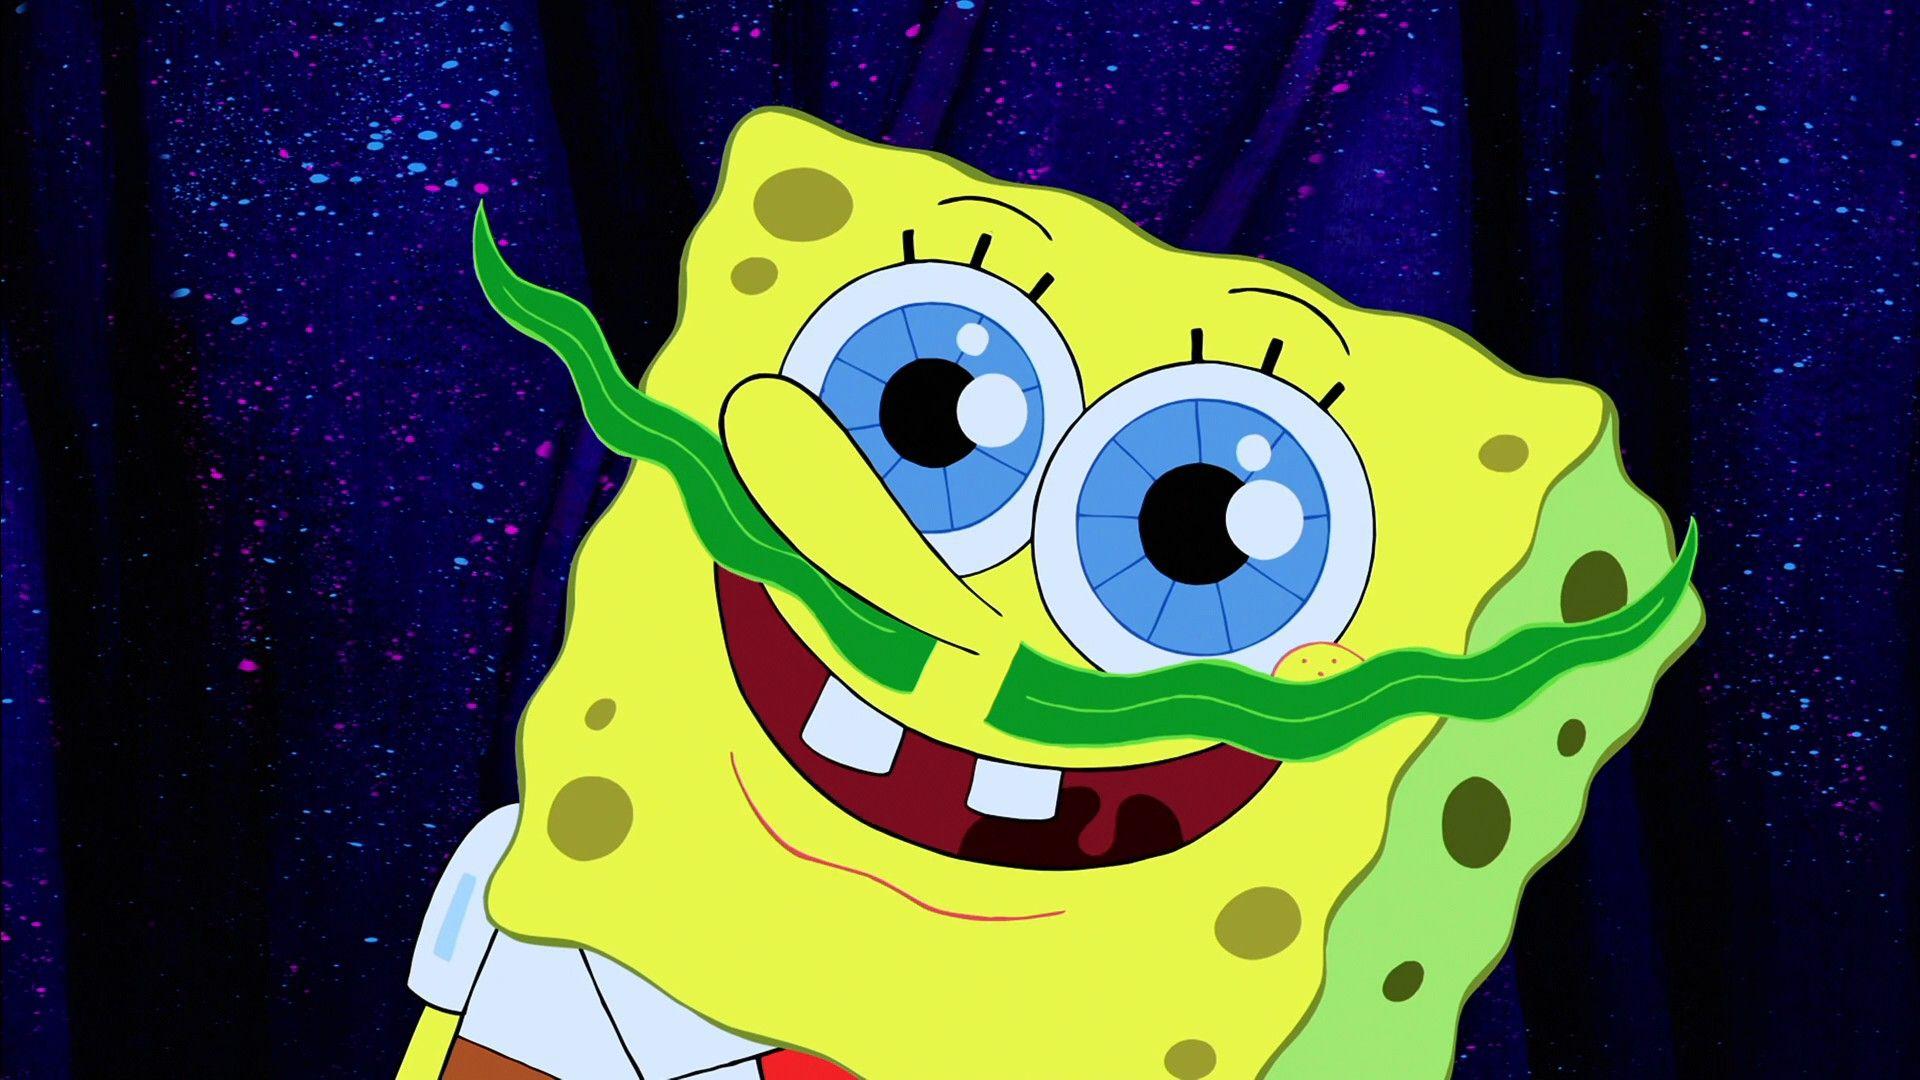 Funny Spongebob Squarepants Pictures Sam_I_am